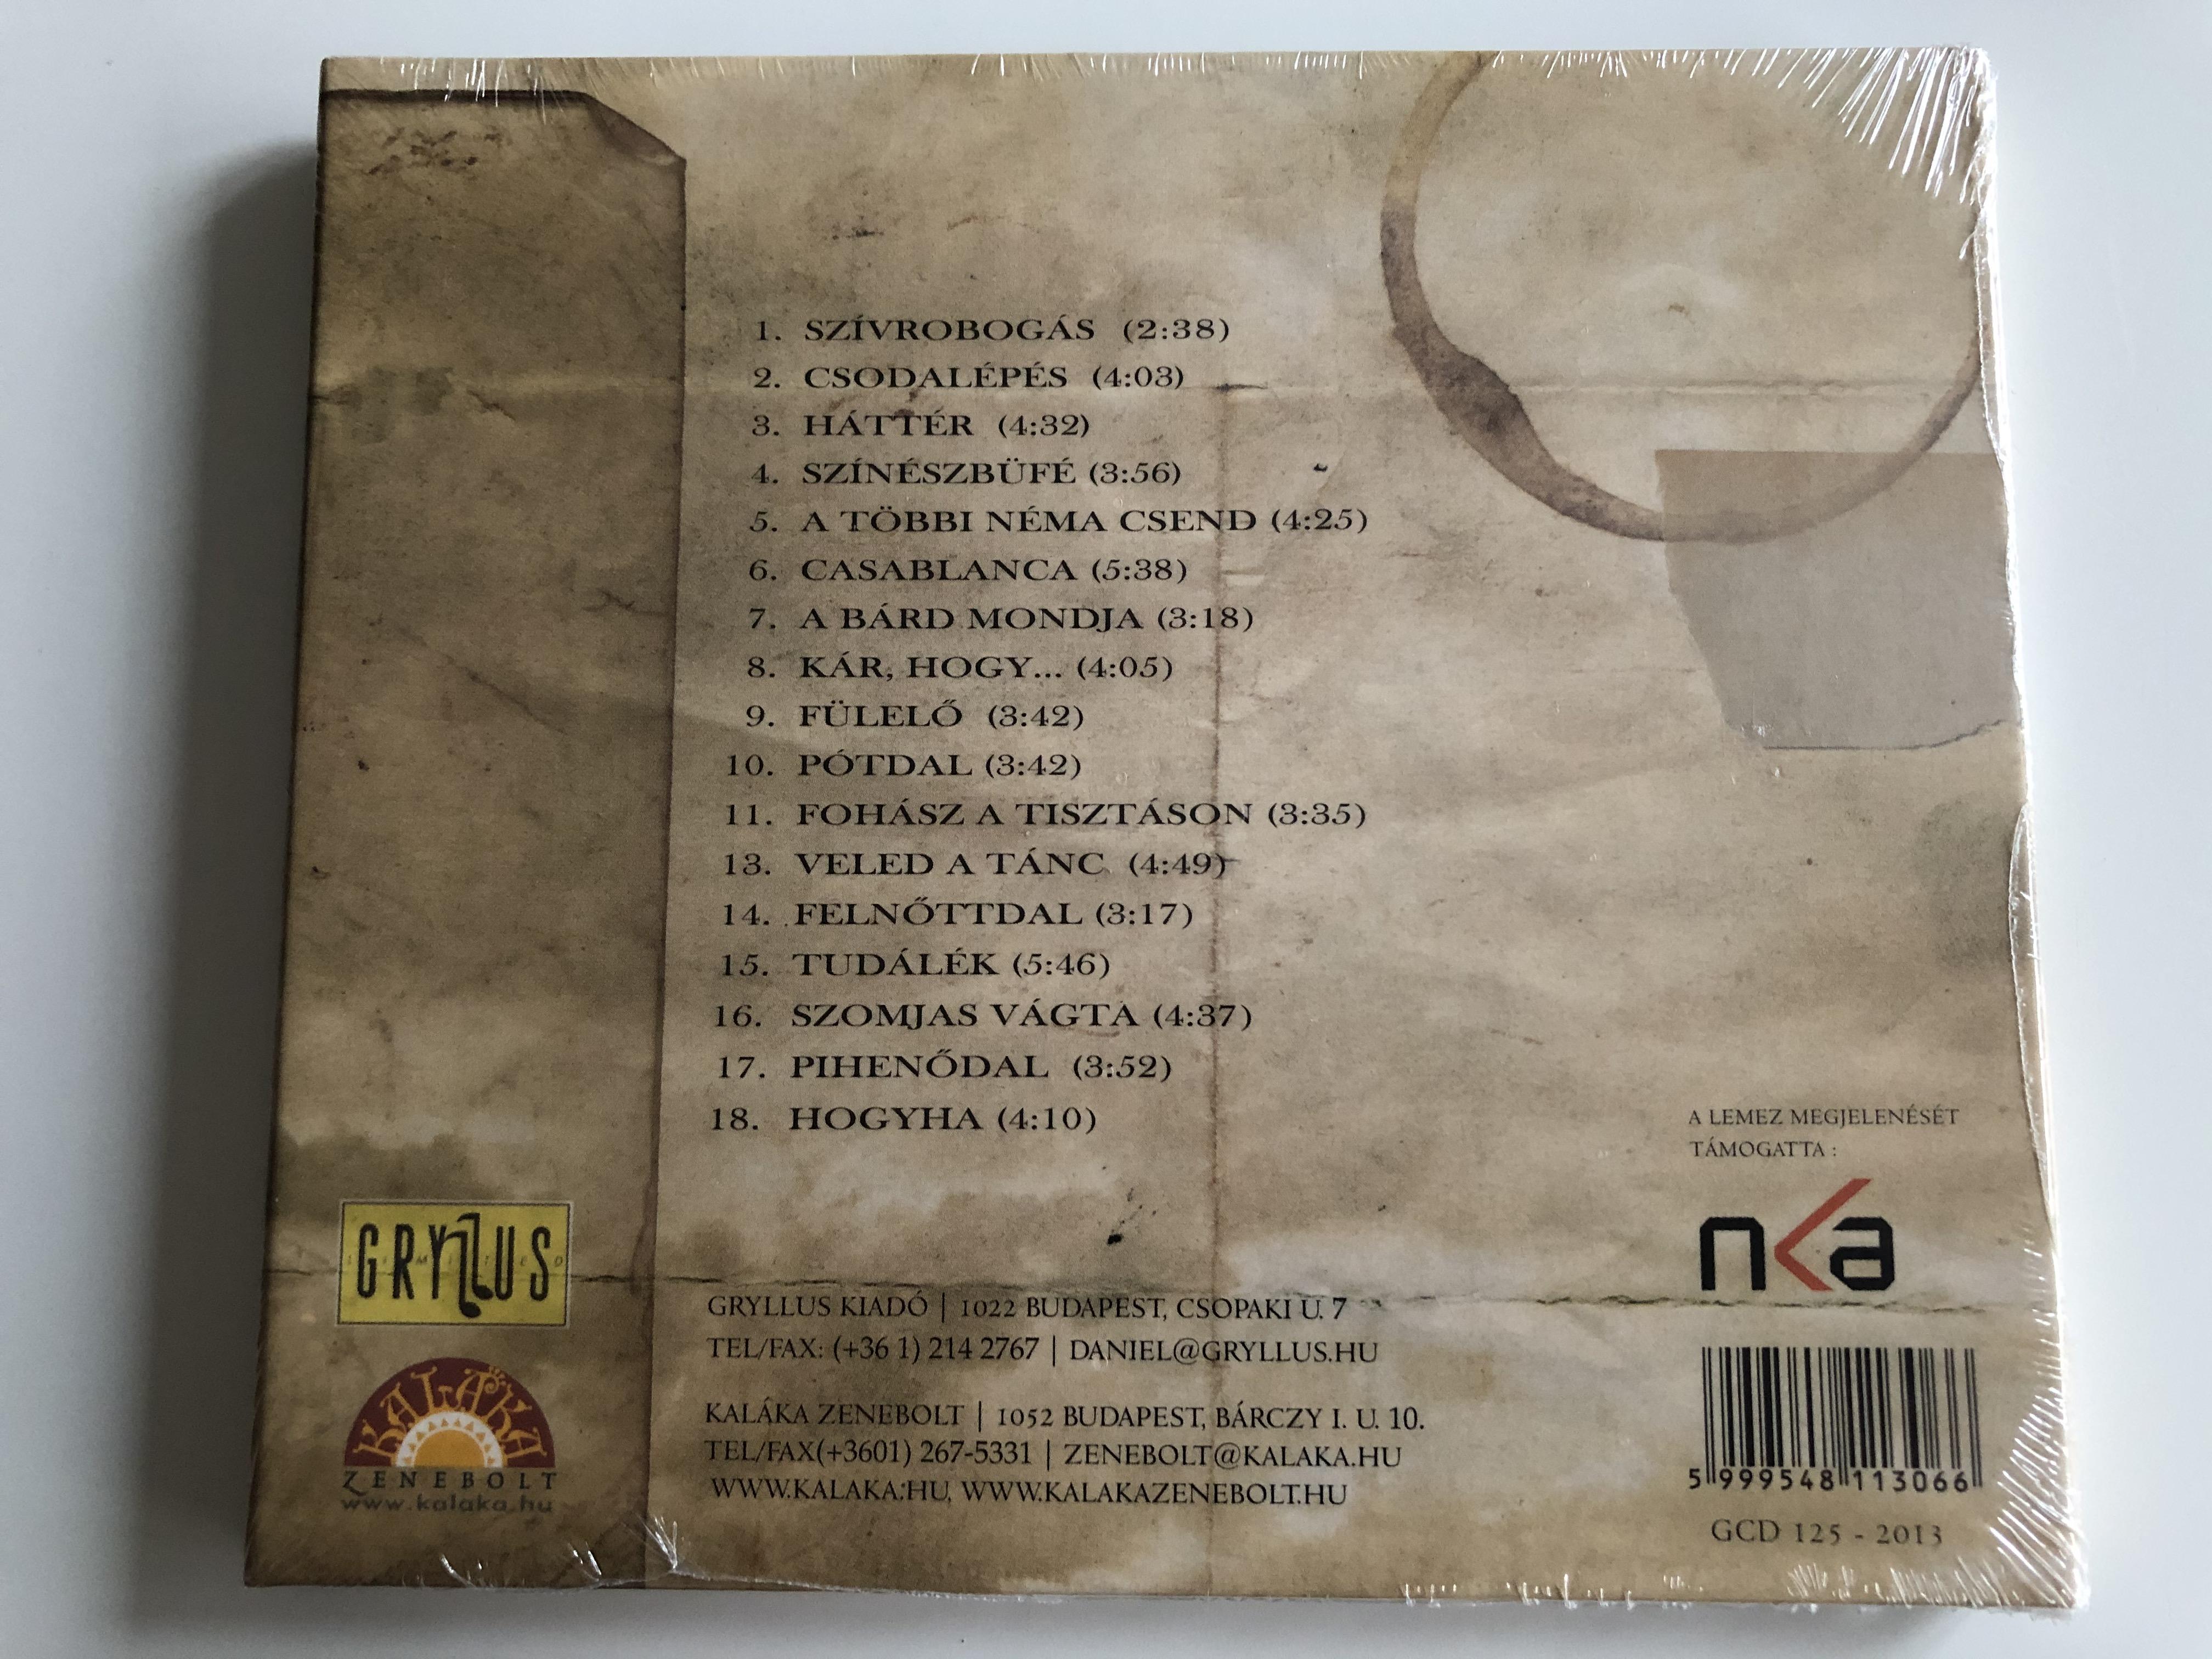 csodal-p-s-r-t-ti-zolt-n-gryllus-audio-cd-2013-gcd-125-2013-2-.jpg